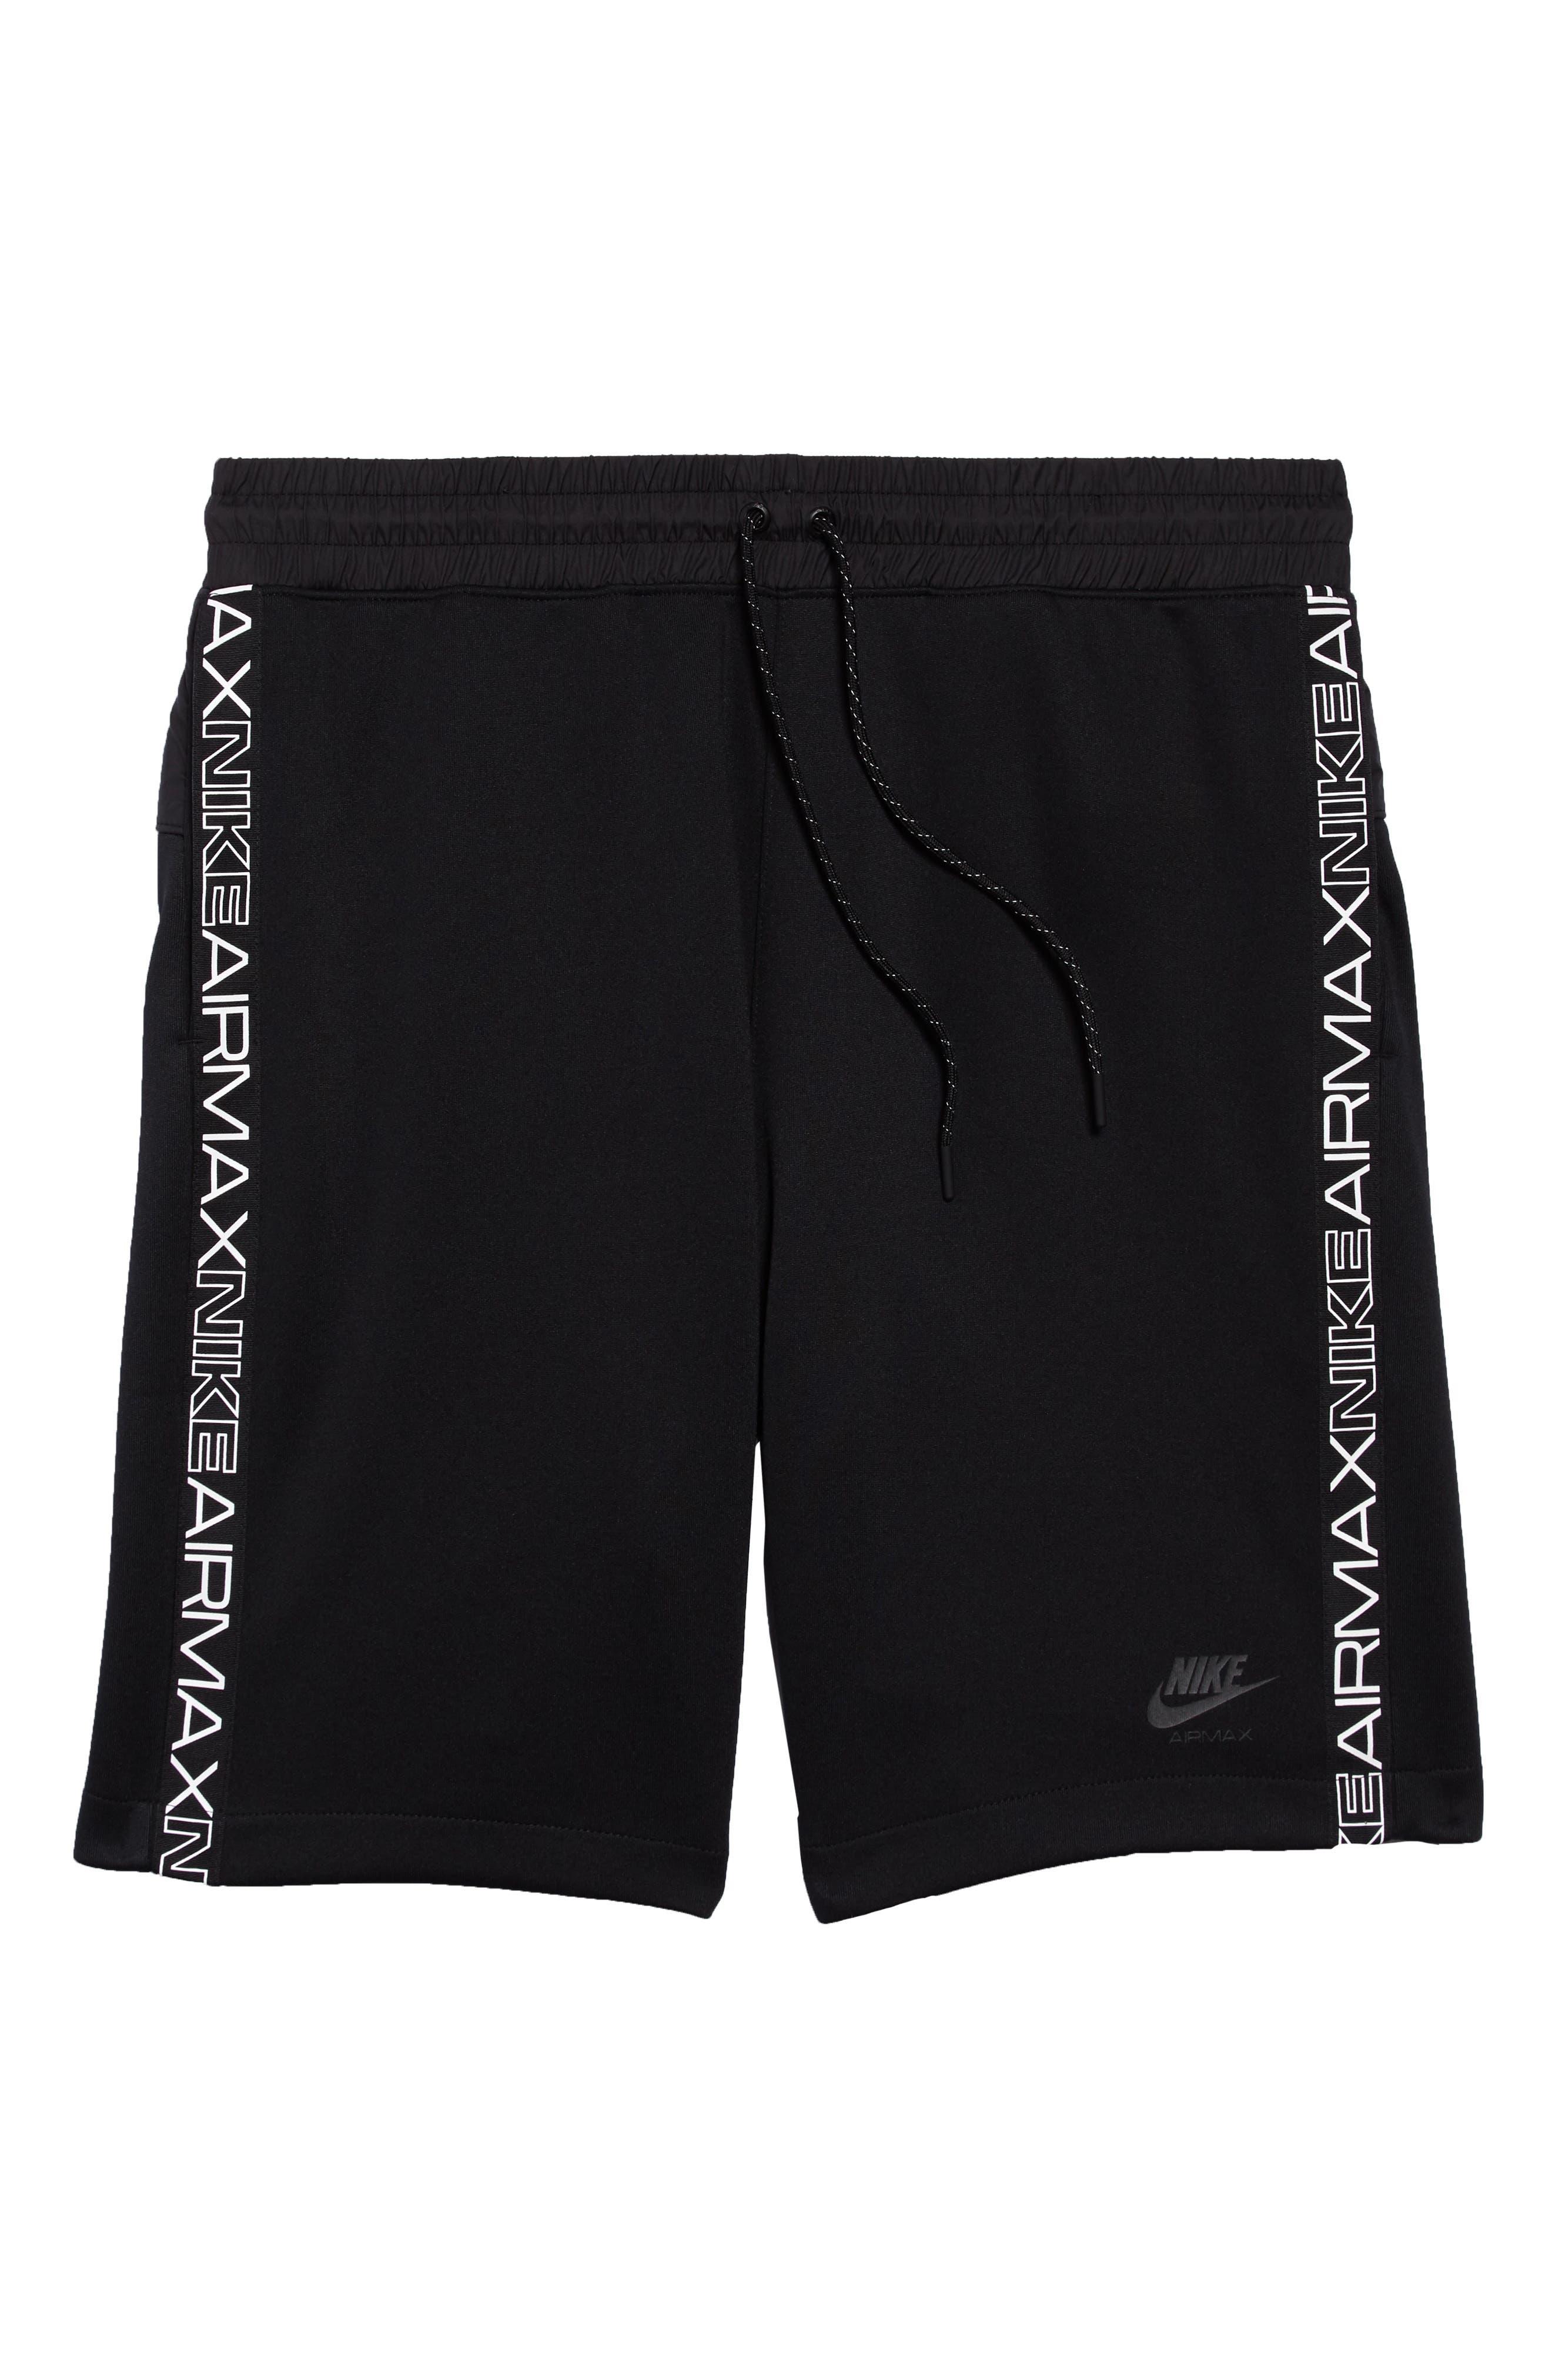 Sportswear Air Max Shorts,                             Alternate thumbnail 6, color,                             010